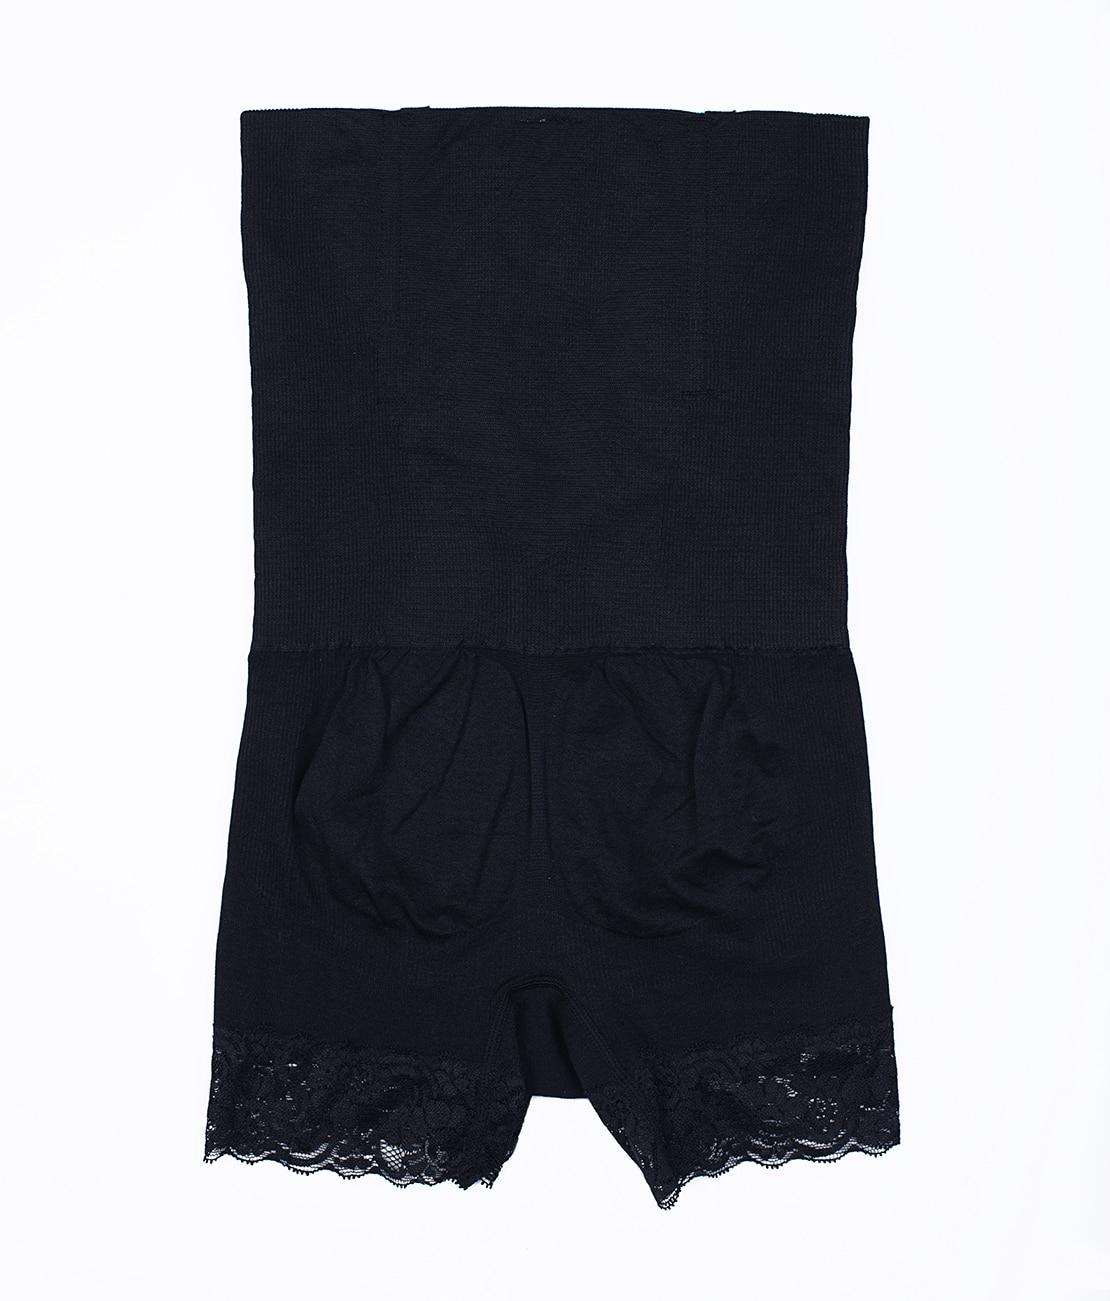 Panty taille haute Noir